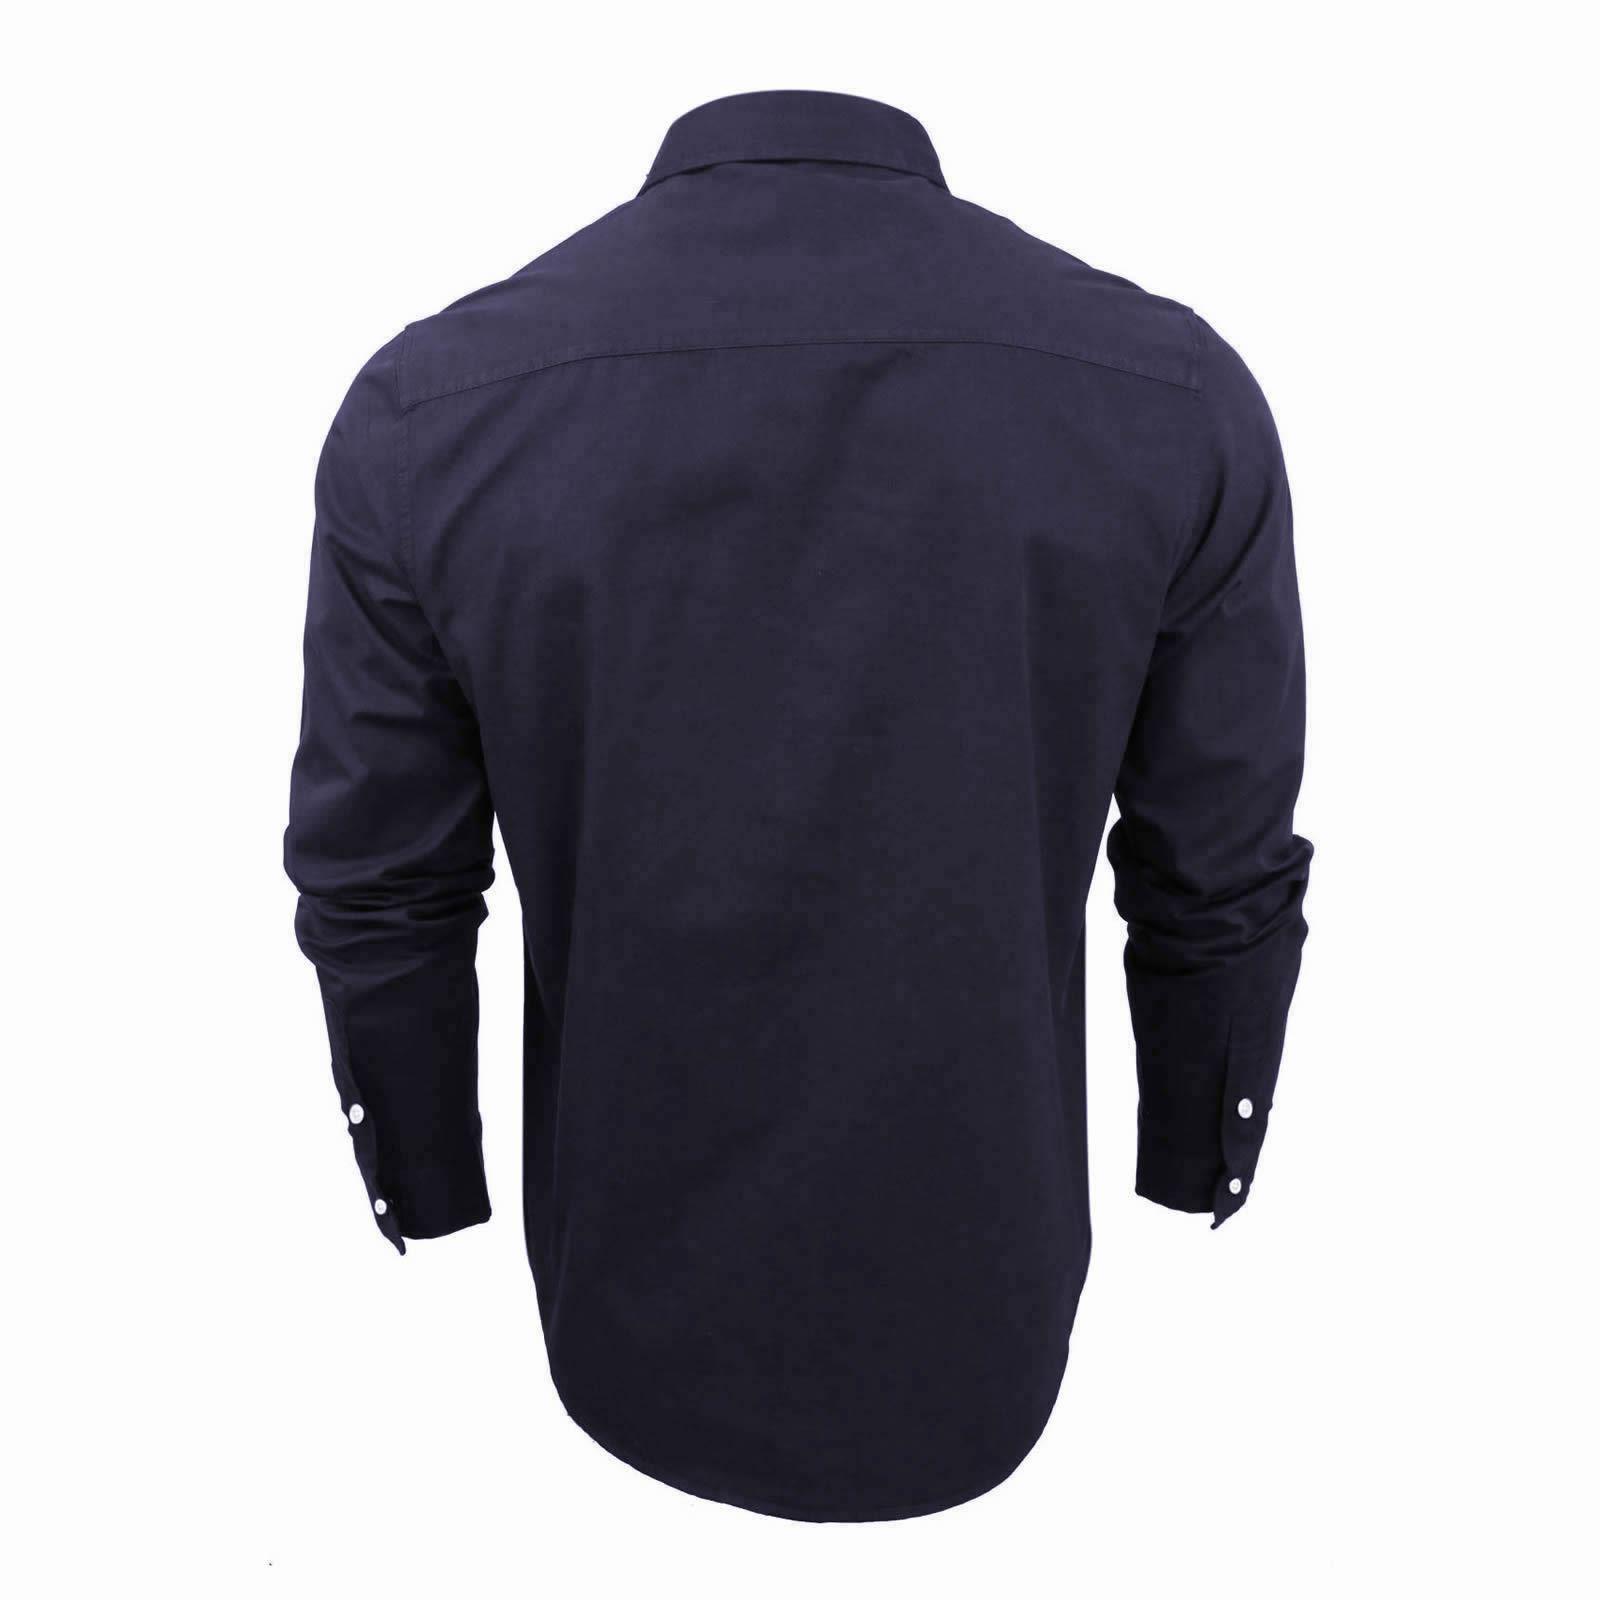 Mens-Shirt-Brave-Soul-Holmes-Long-Sleeve-Cotton-Canvas-Casual-Top thumbnail 5